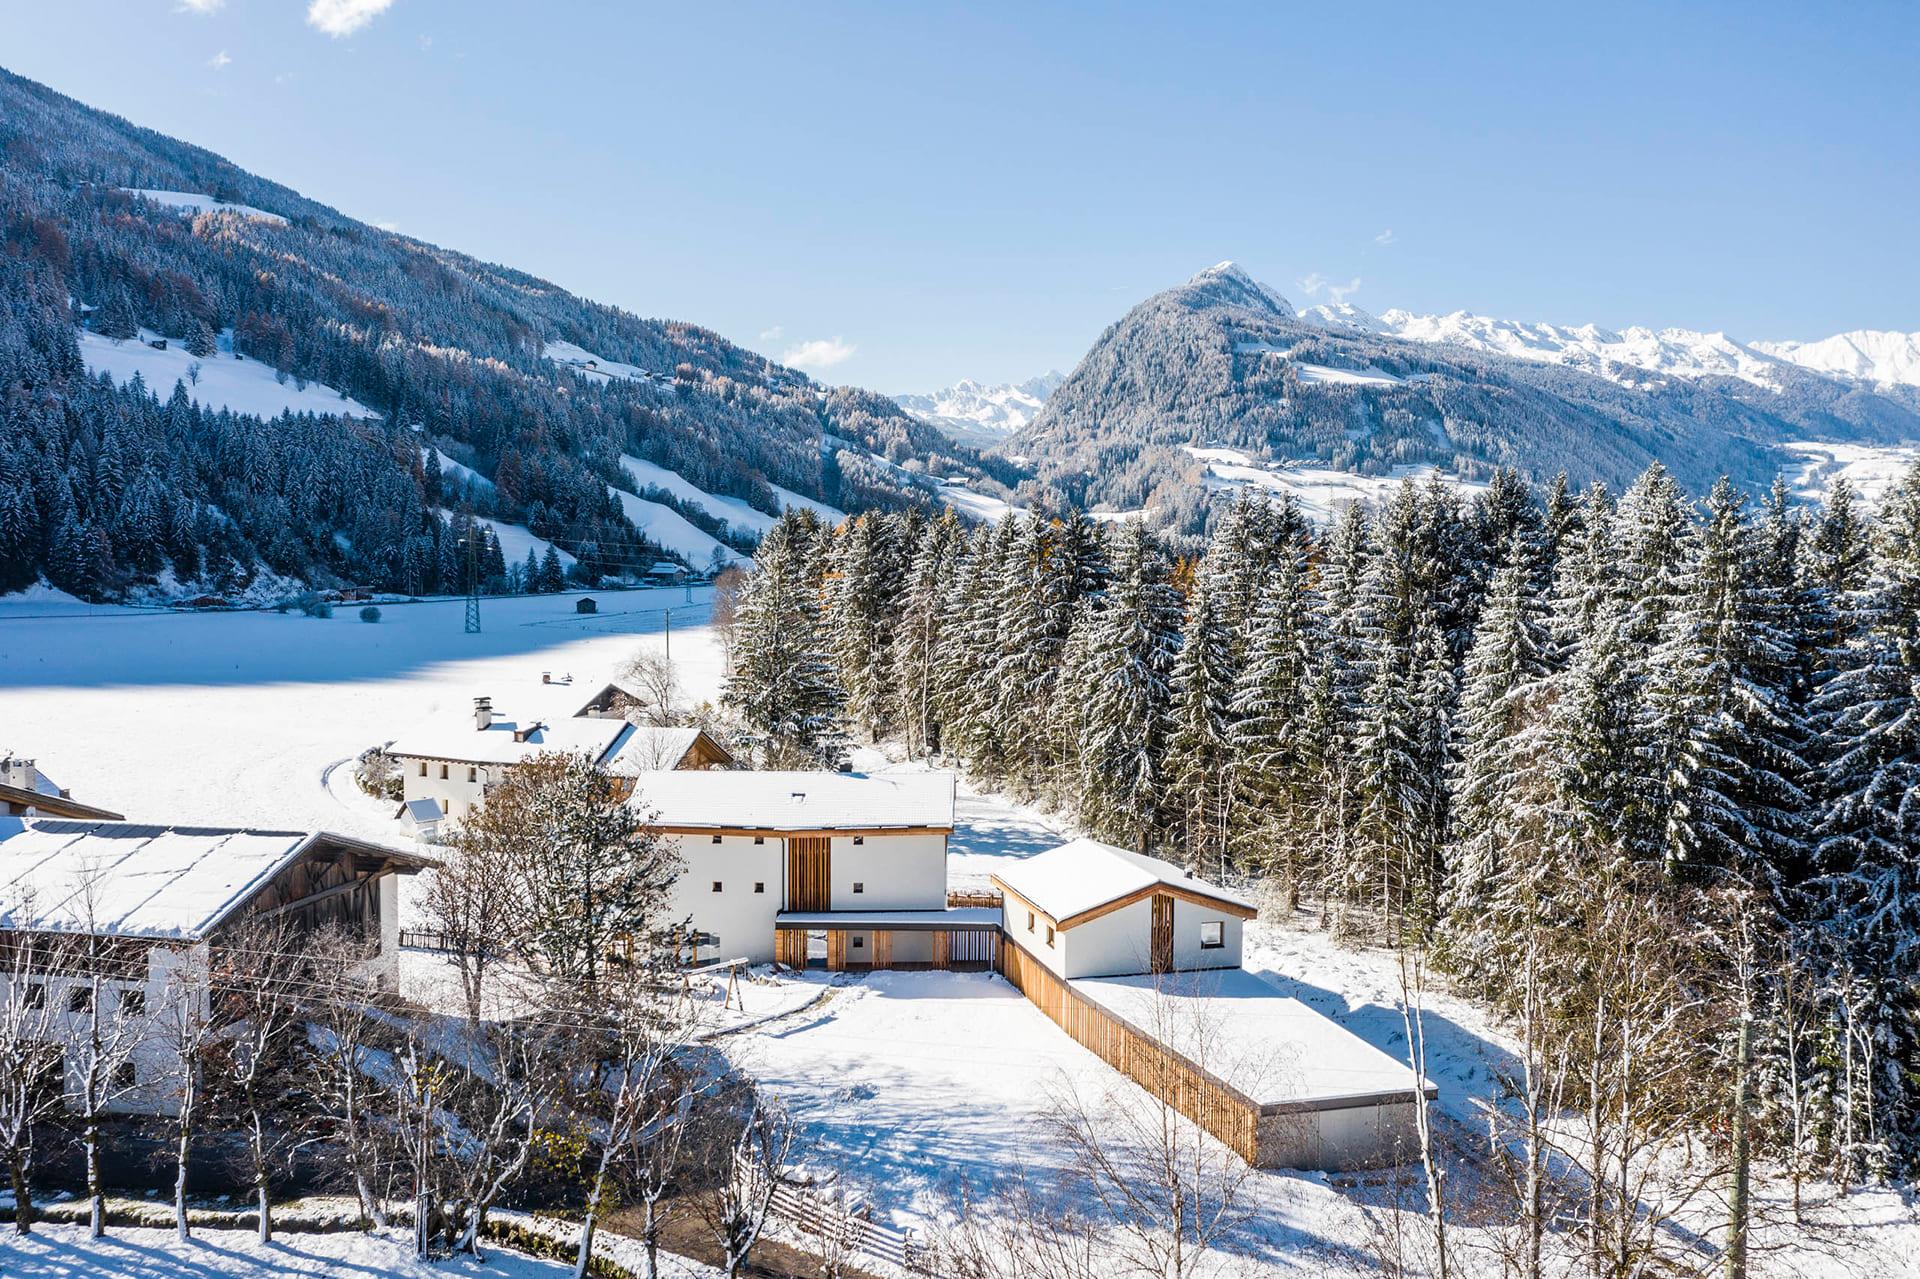 Lichtung Woldererhof - Winter